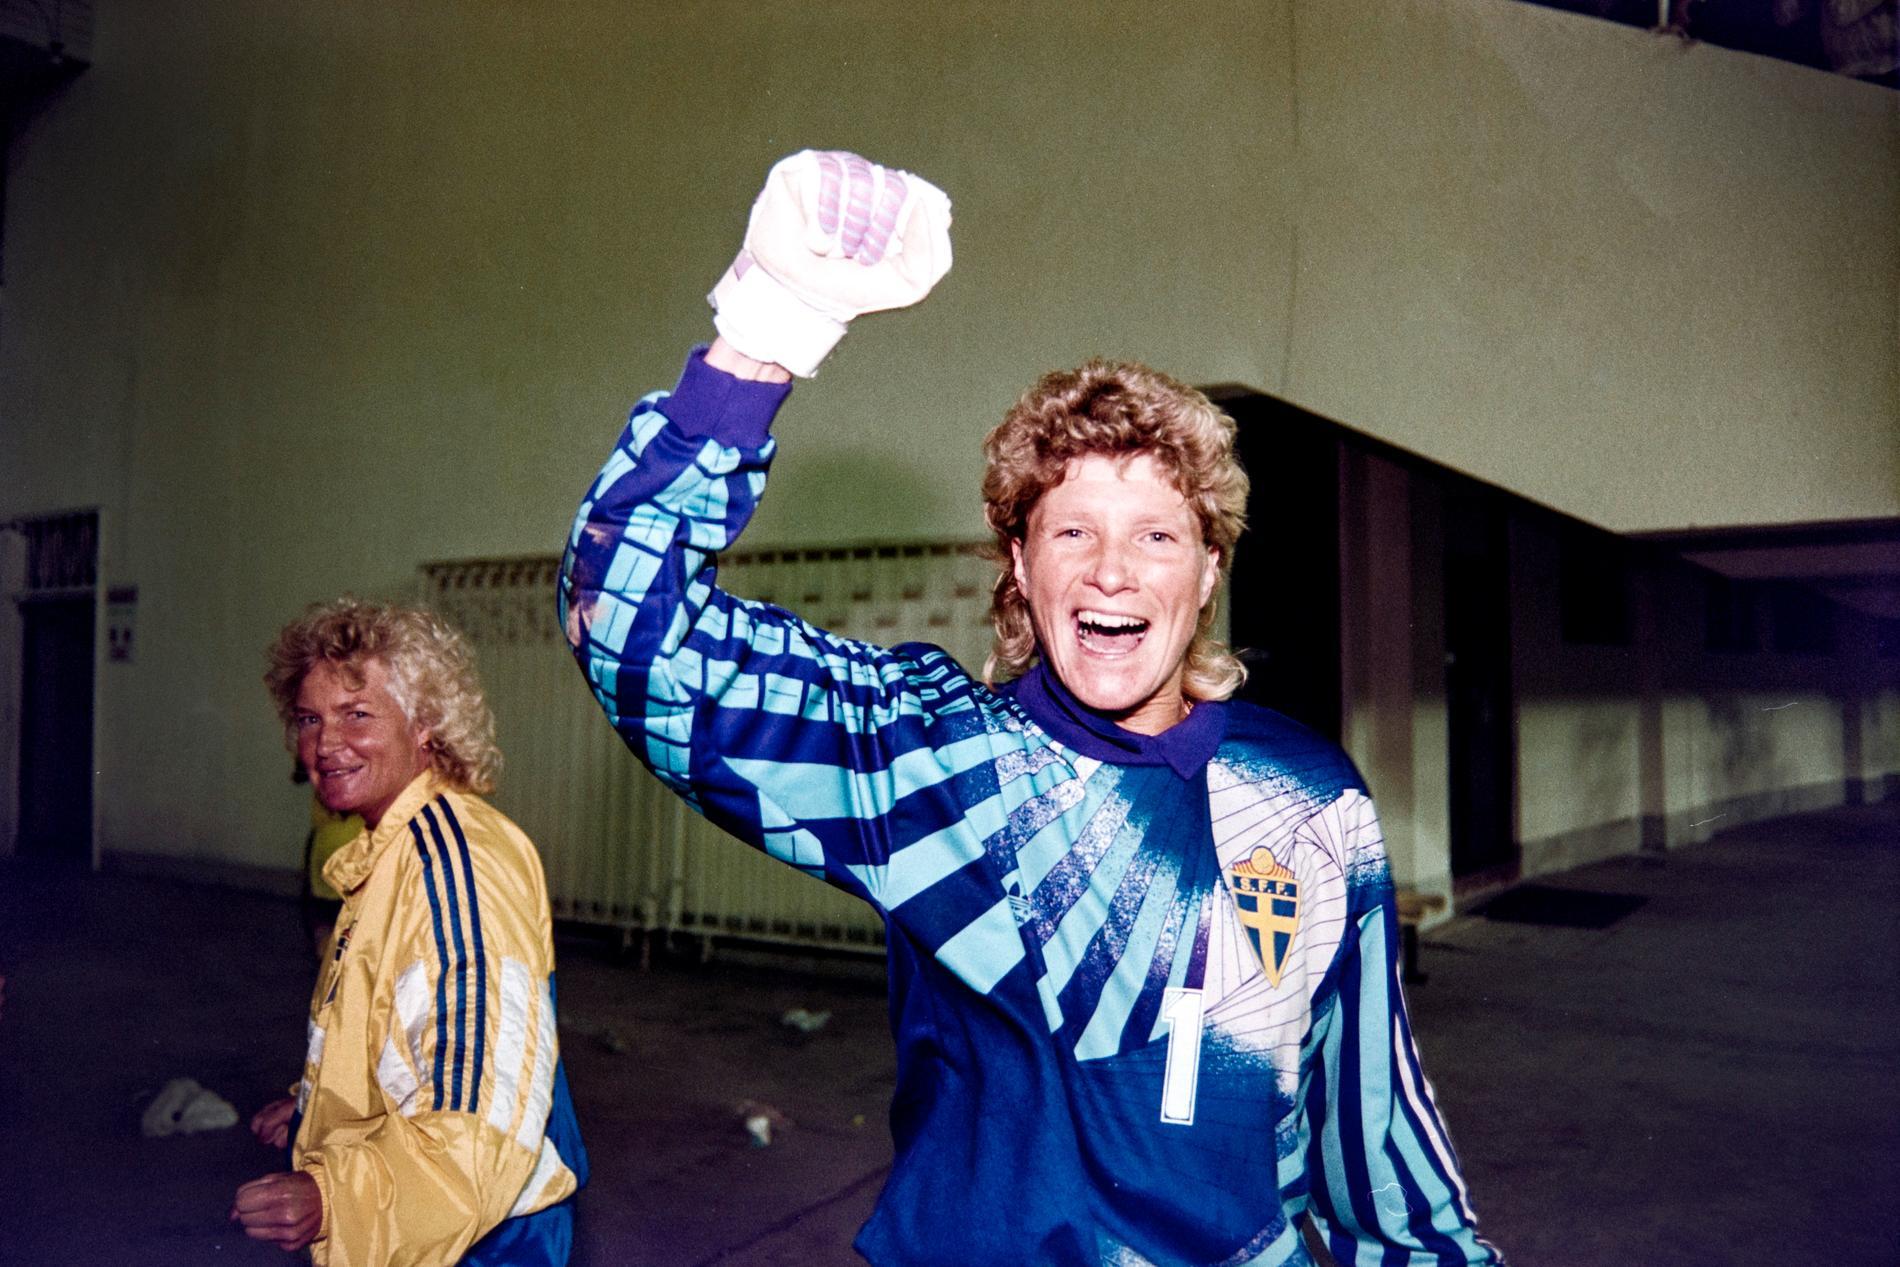 Elisabeth Leidinge, Em-guldmedaljör och banbrytande på målvaktz